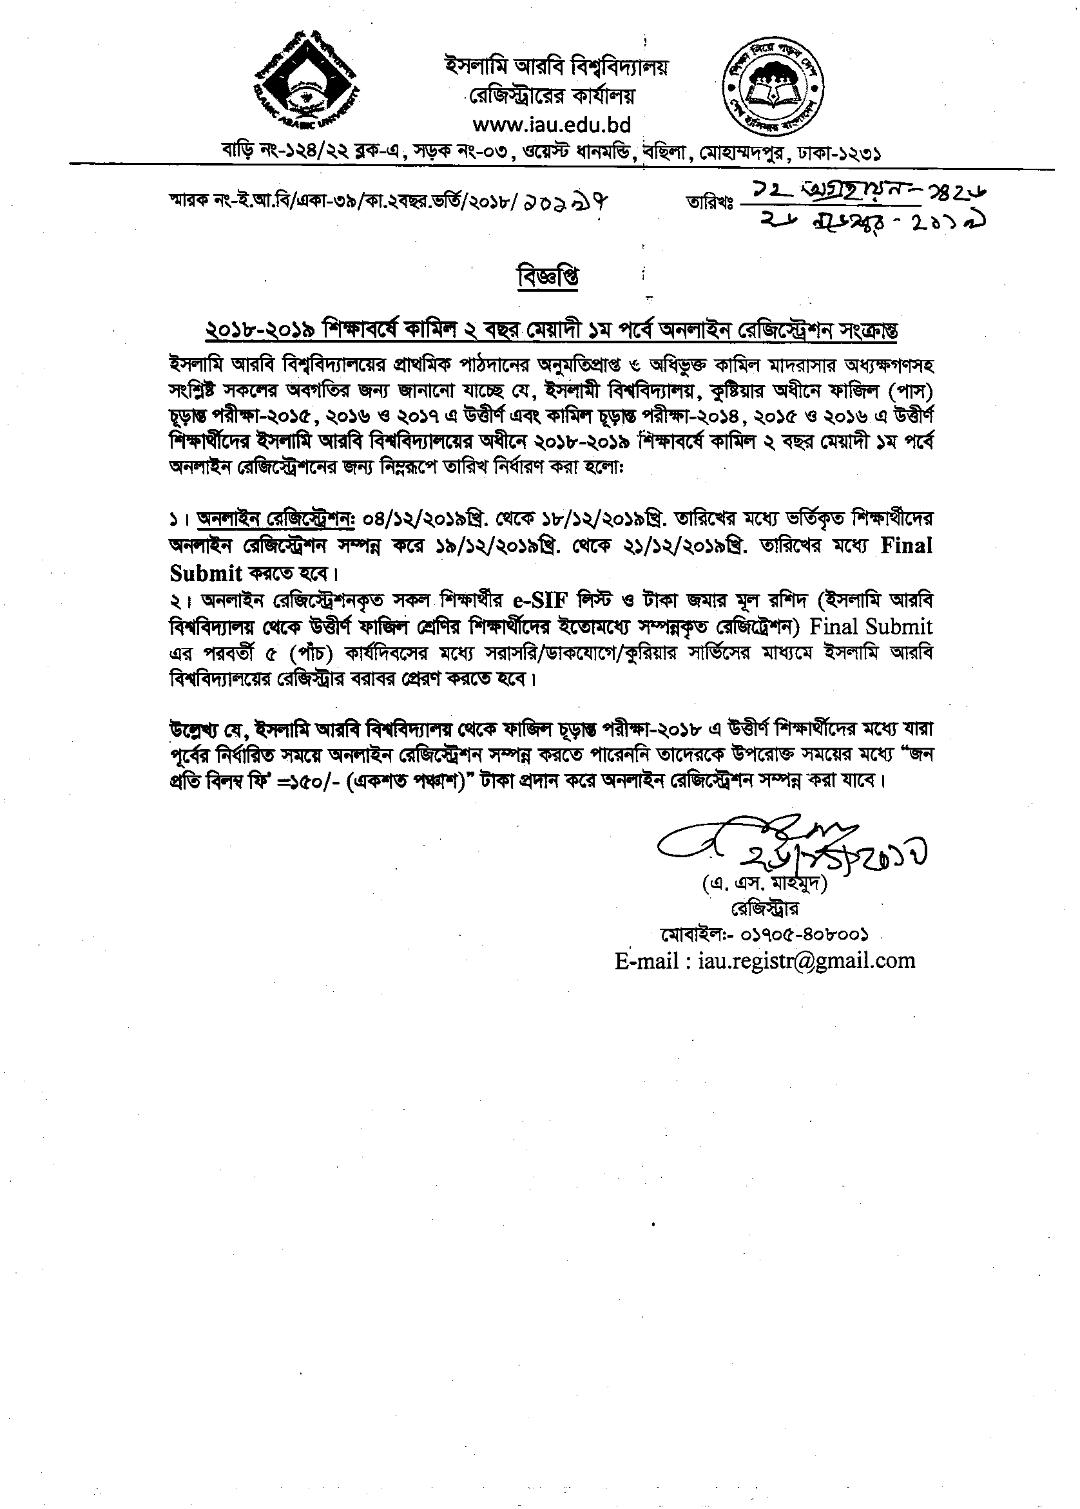 kamil 1st part registration notice